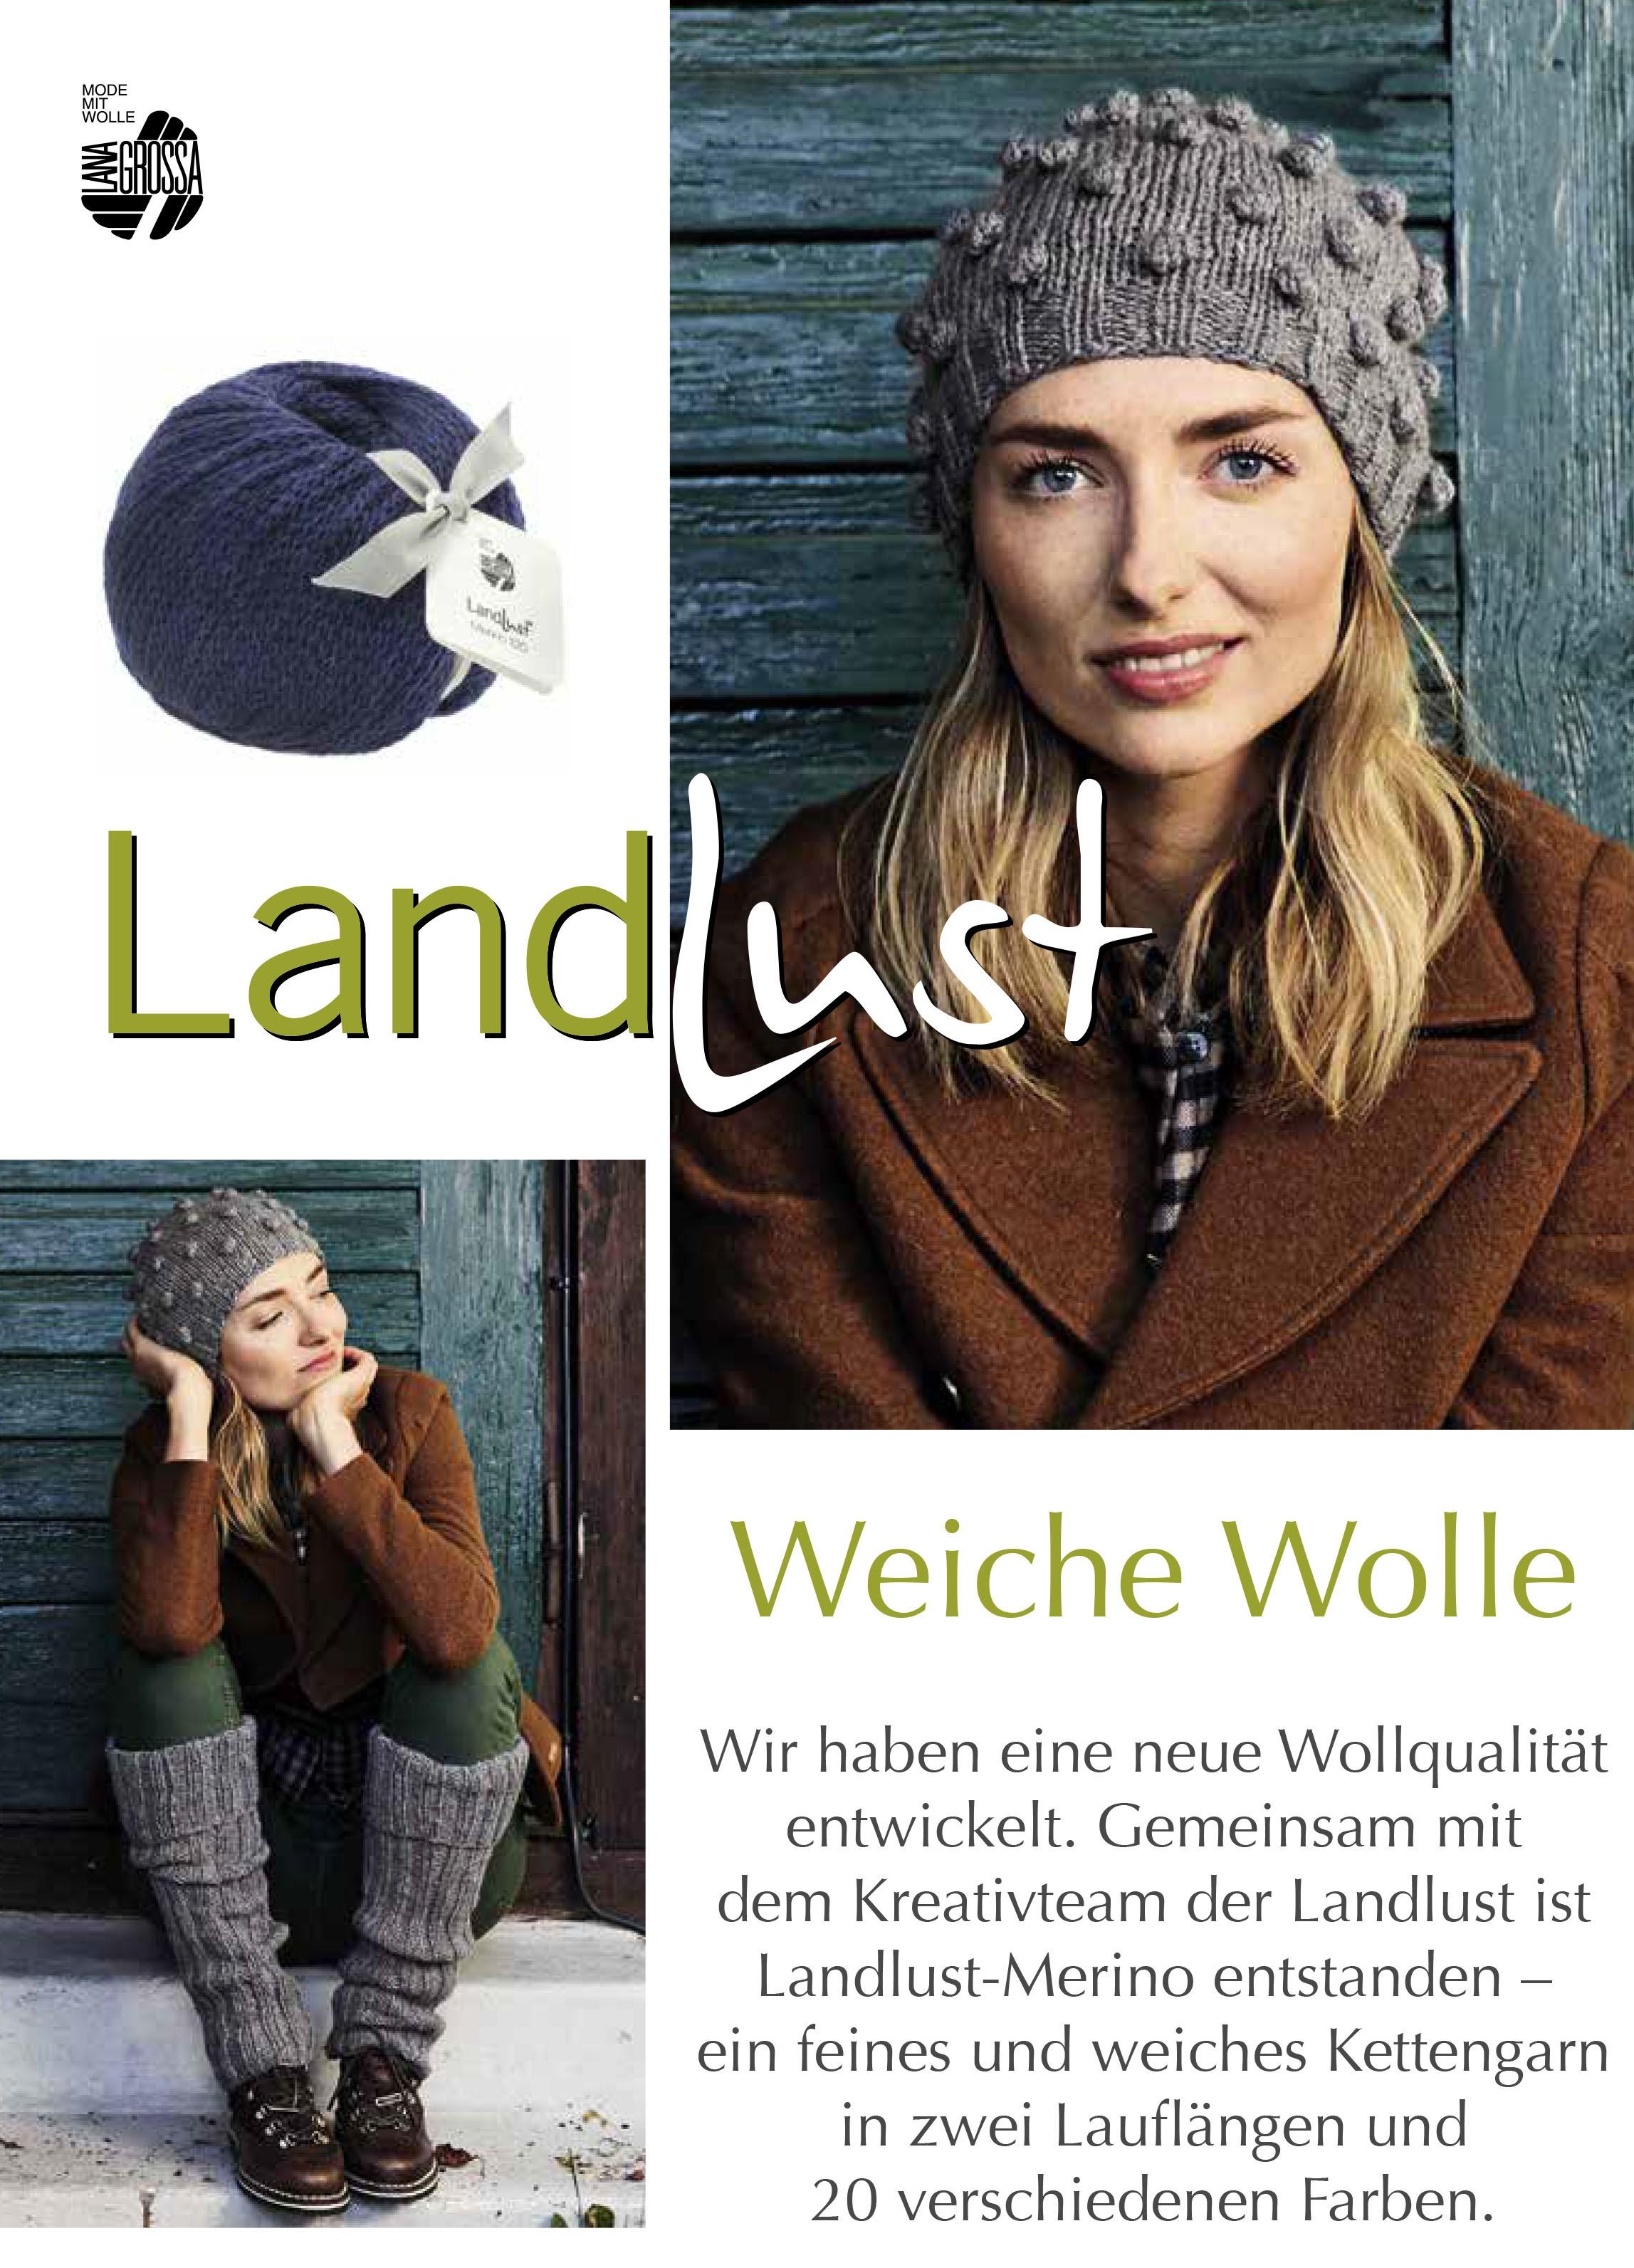 Lana Grossa LANDLUST Flyer 2